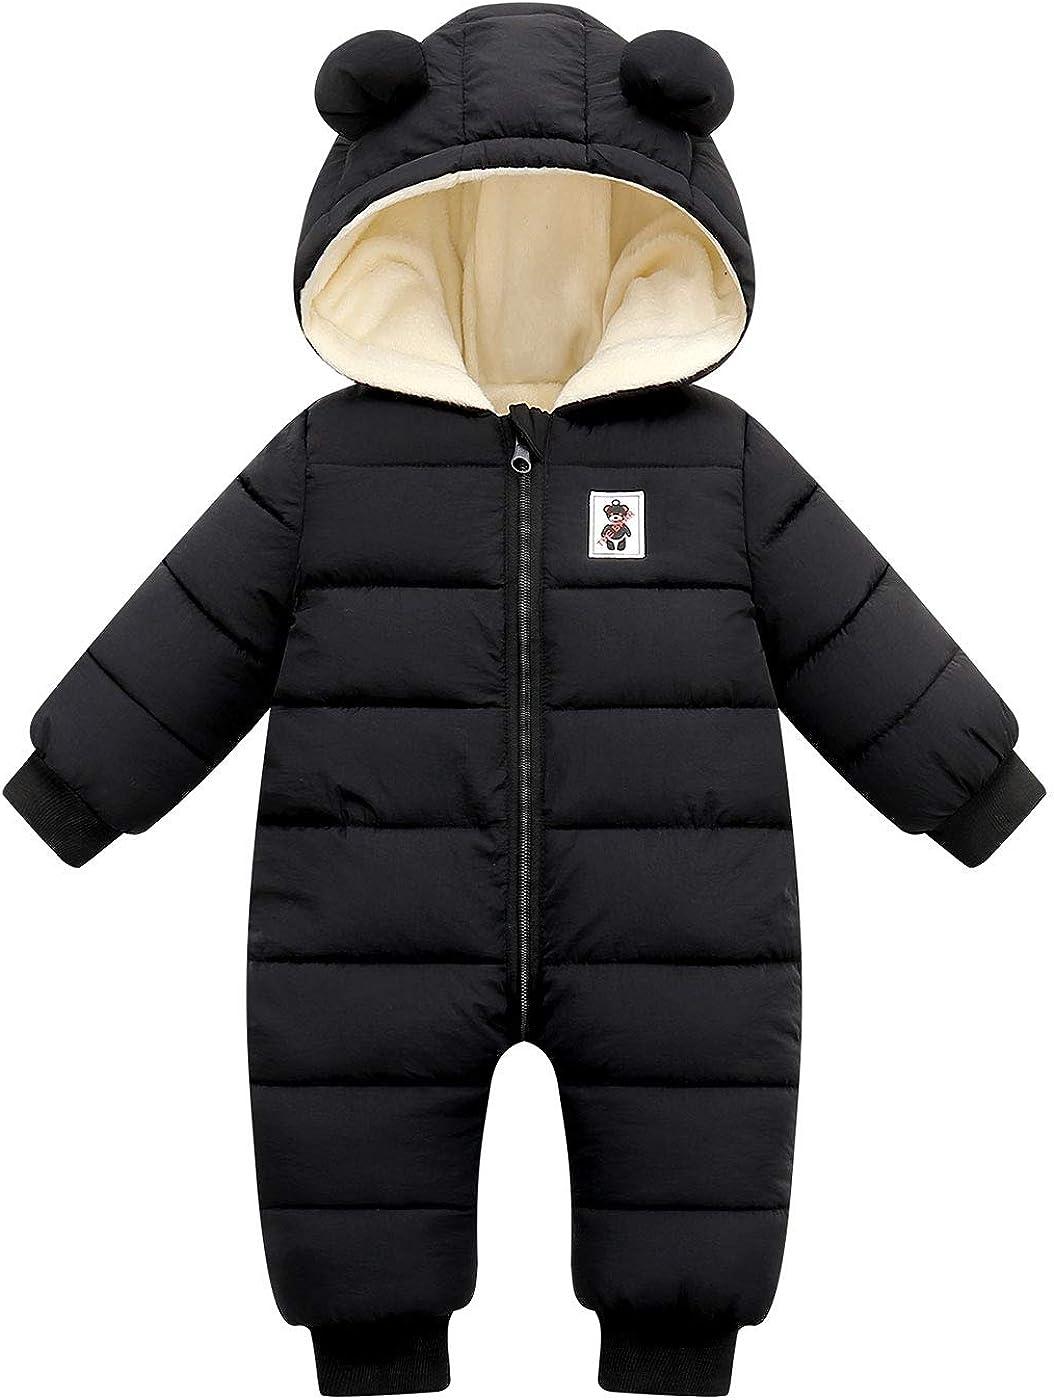 Max 69% OFF Ranking TOP8 Happy Cherry Baby Girls Boys Warm Ro Coat Snowsuit Jumpsuit Down